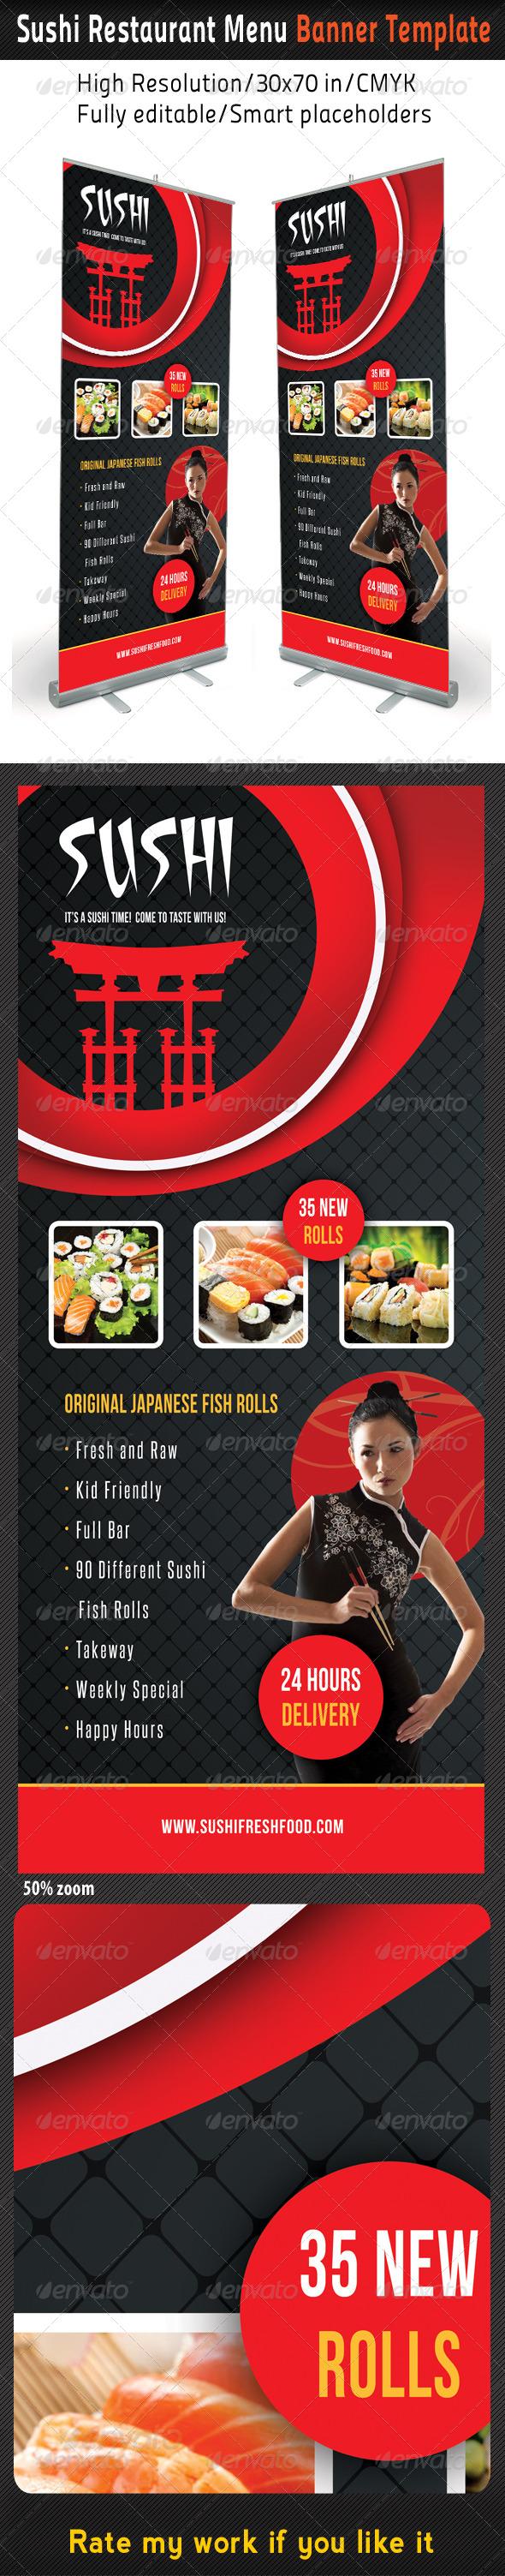 Sushi Restaurant Menu Banner Template 03